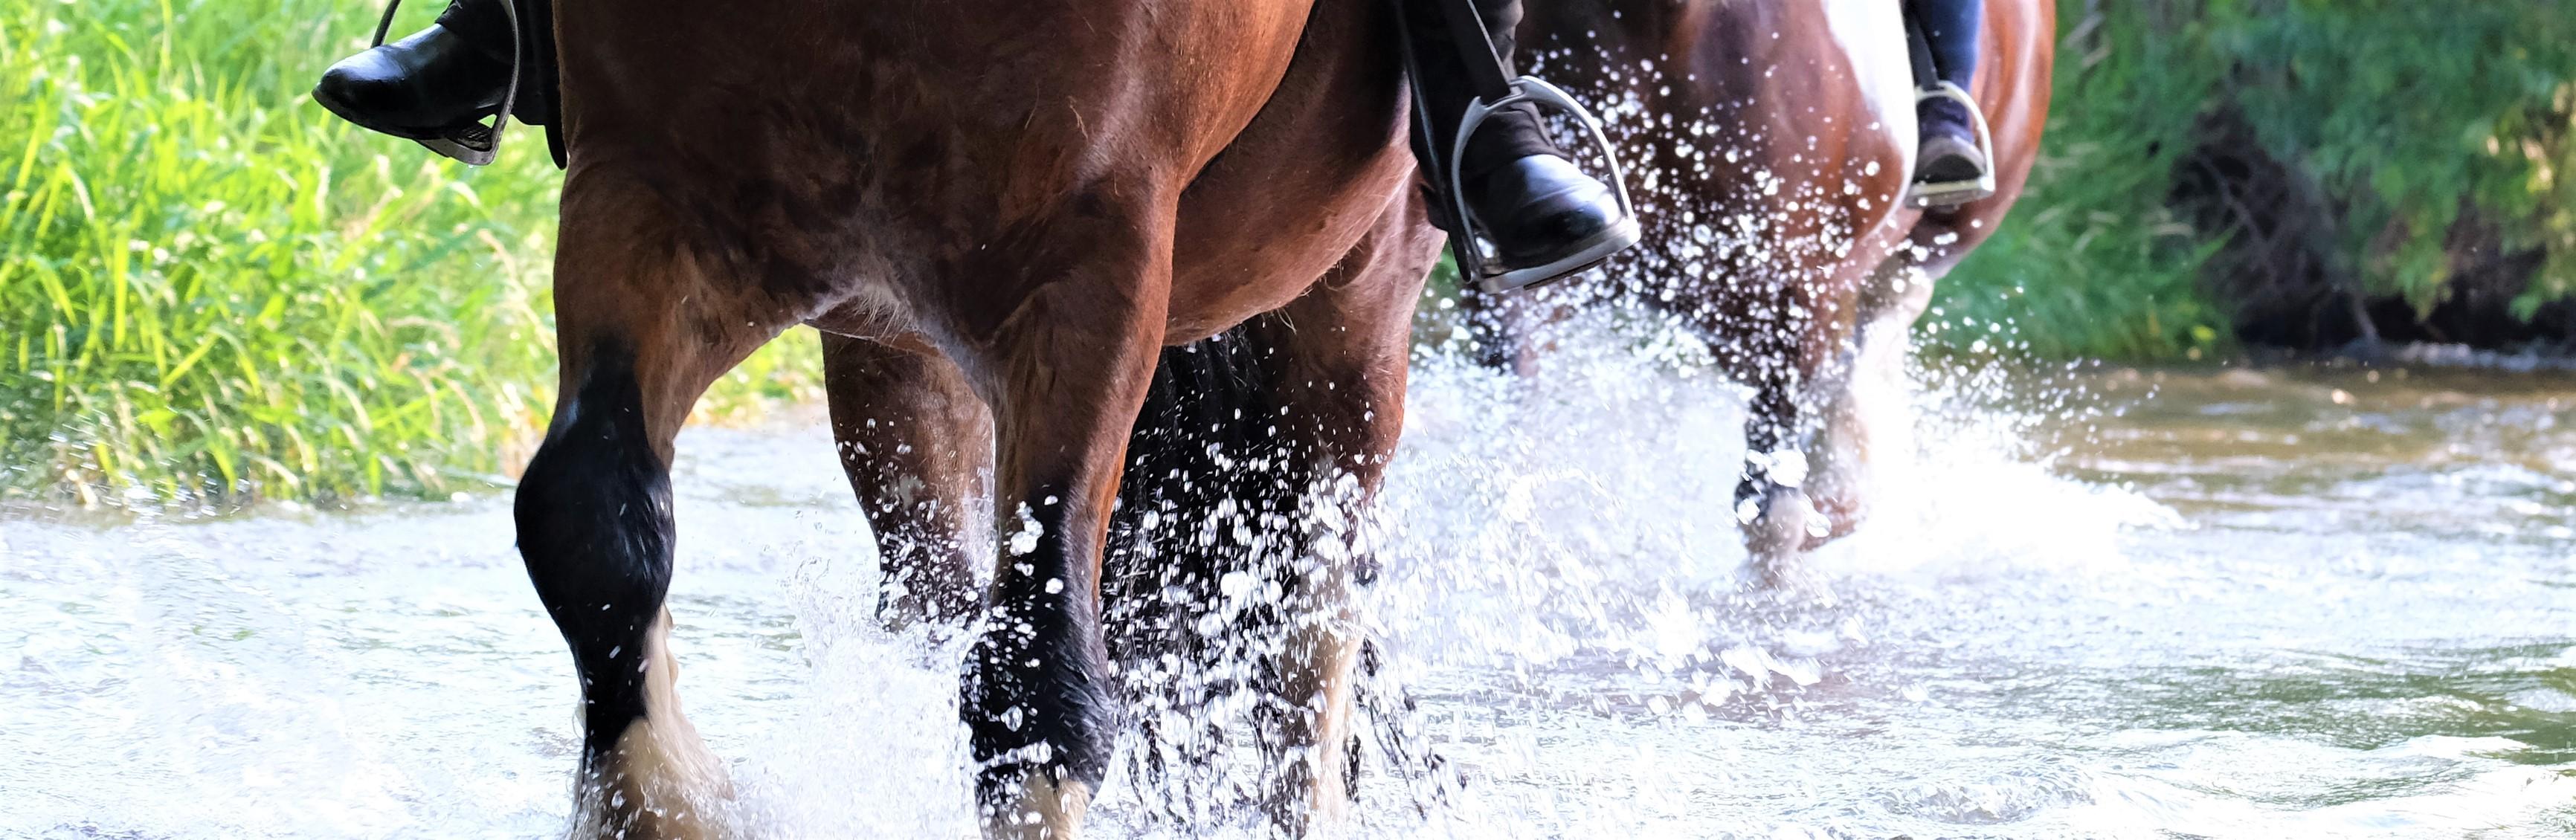 Llannerch River Ride 1 Aug 2019 (49)